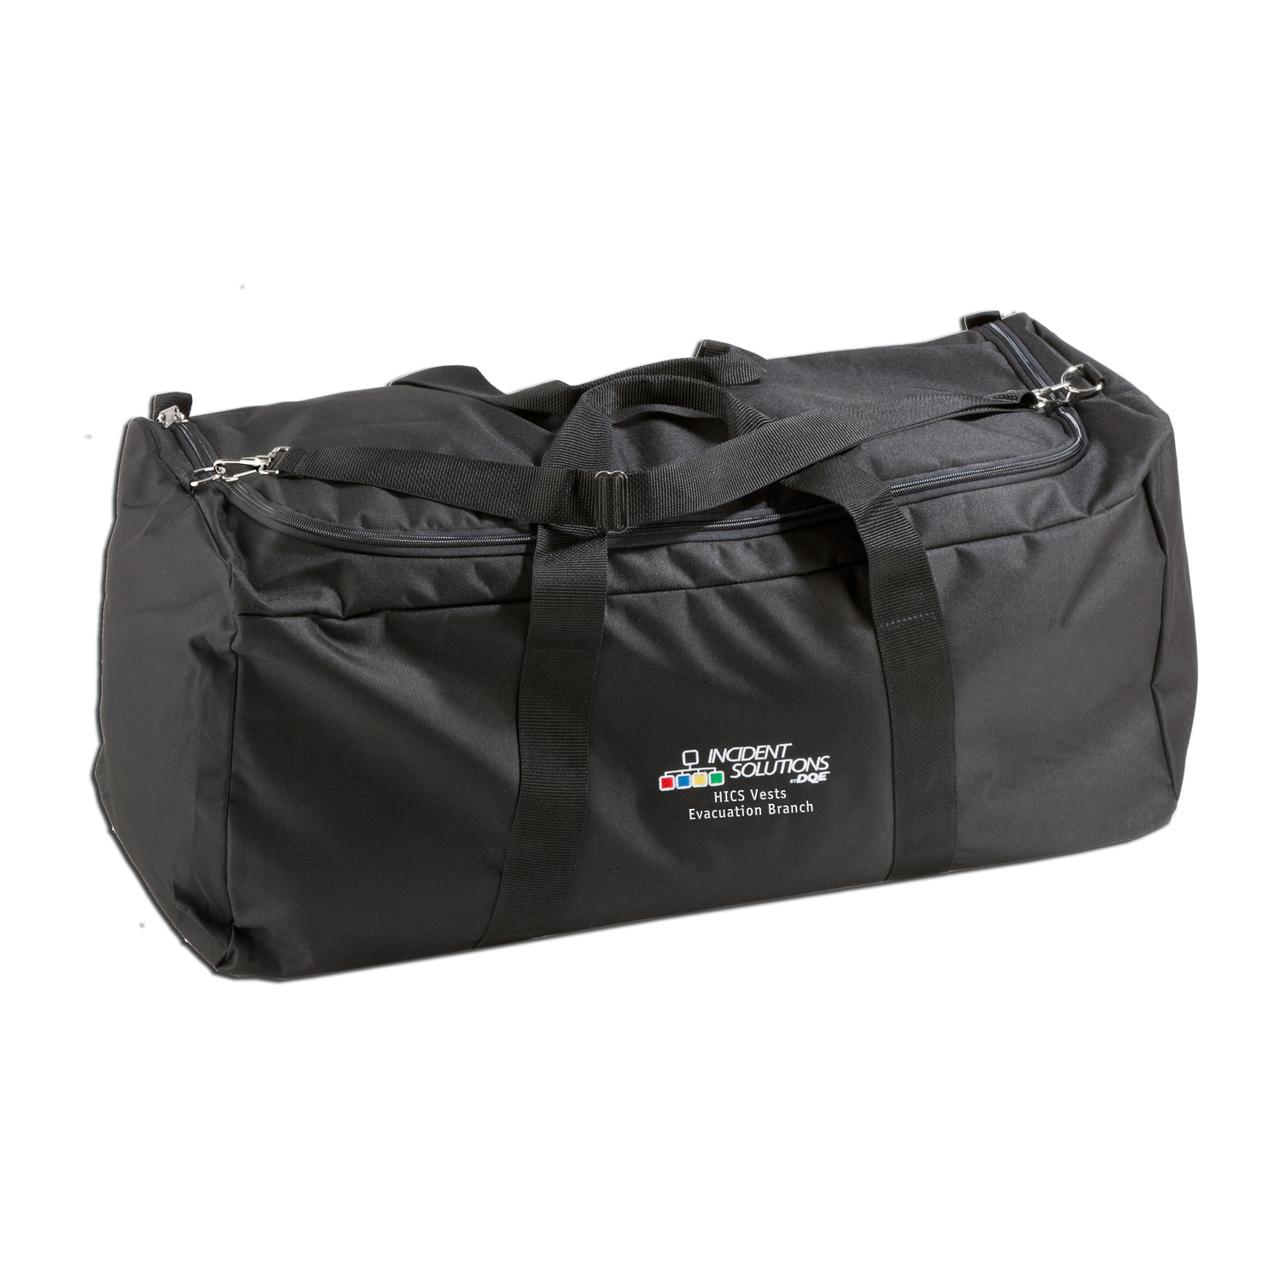 HICS Vests - Evacuation Branch Carry Bag image